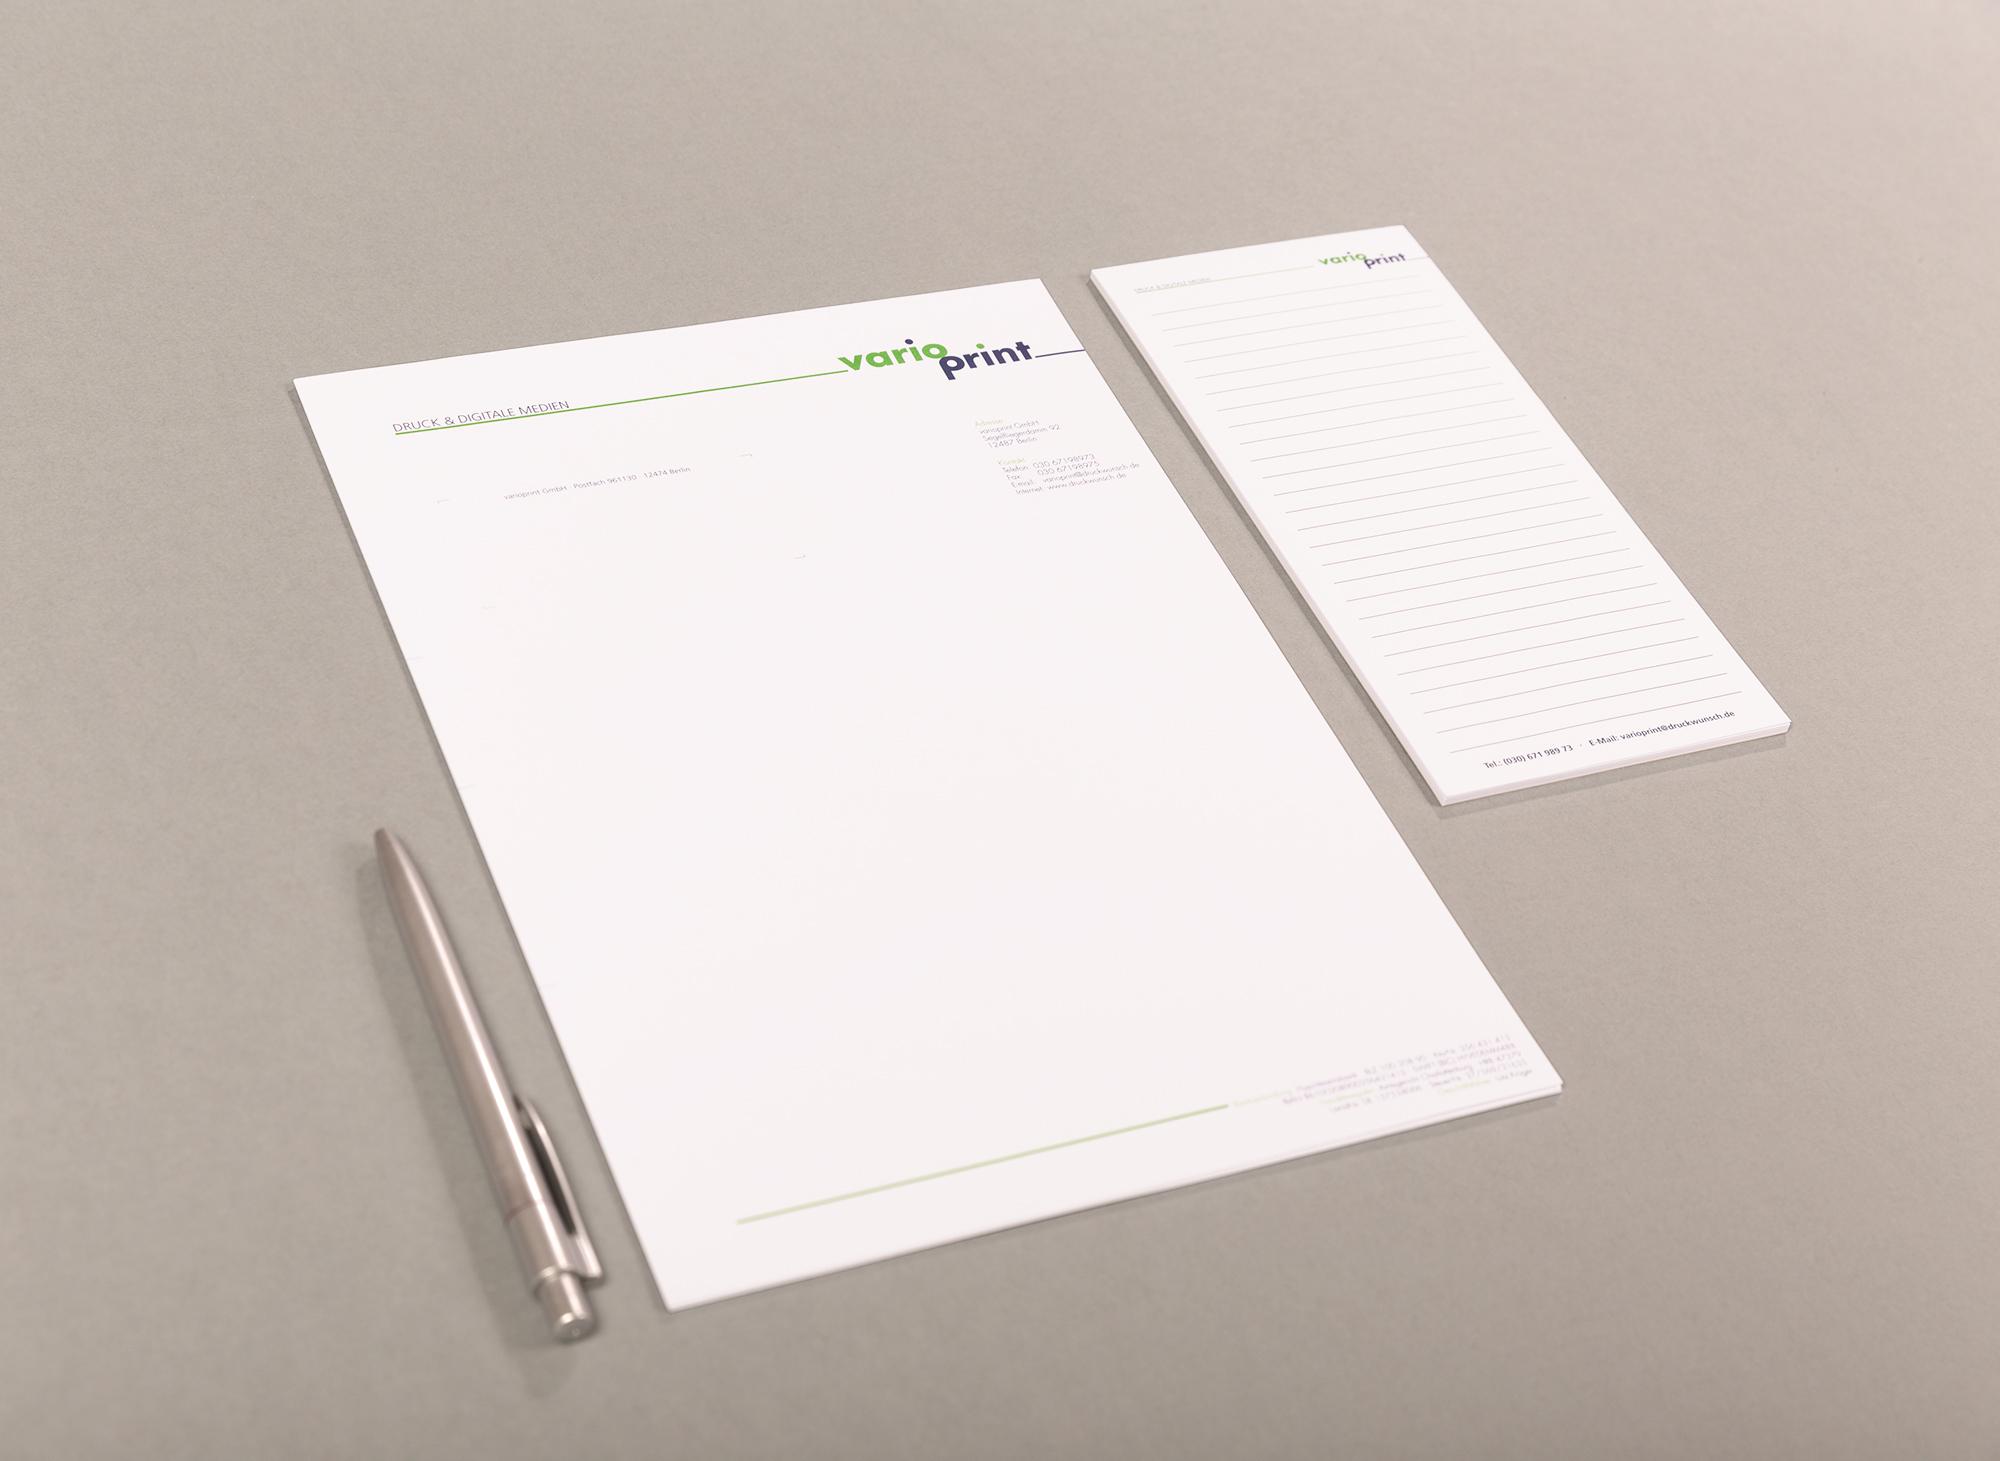 Briefbogen oder Kopfbogen oder Logopapier